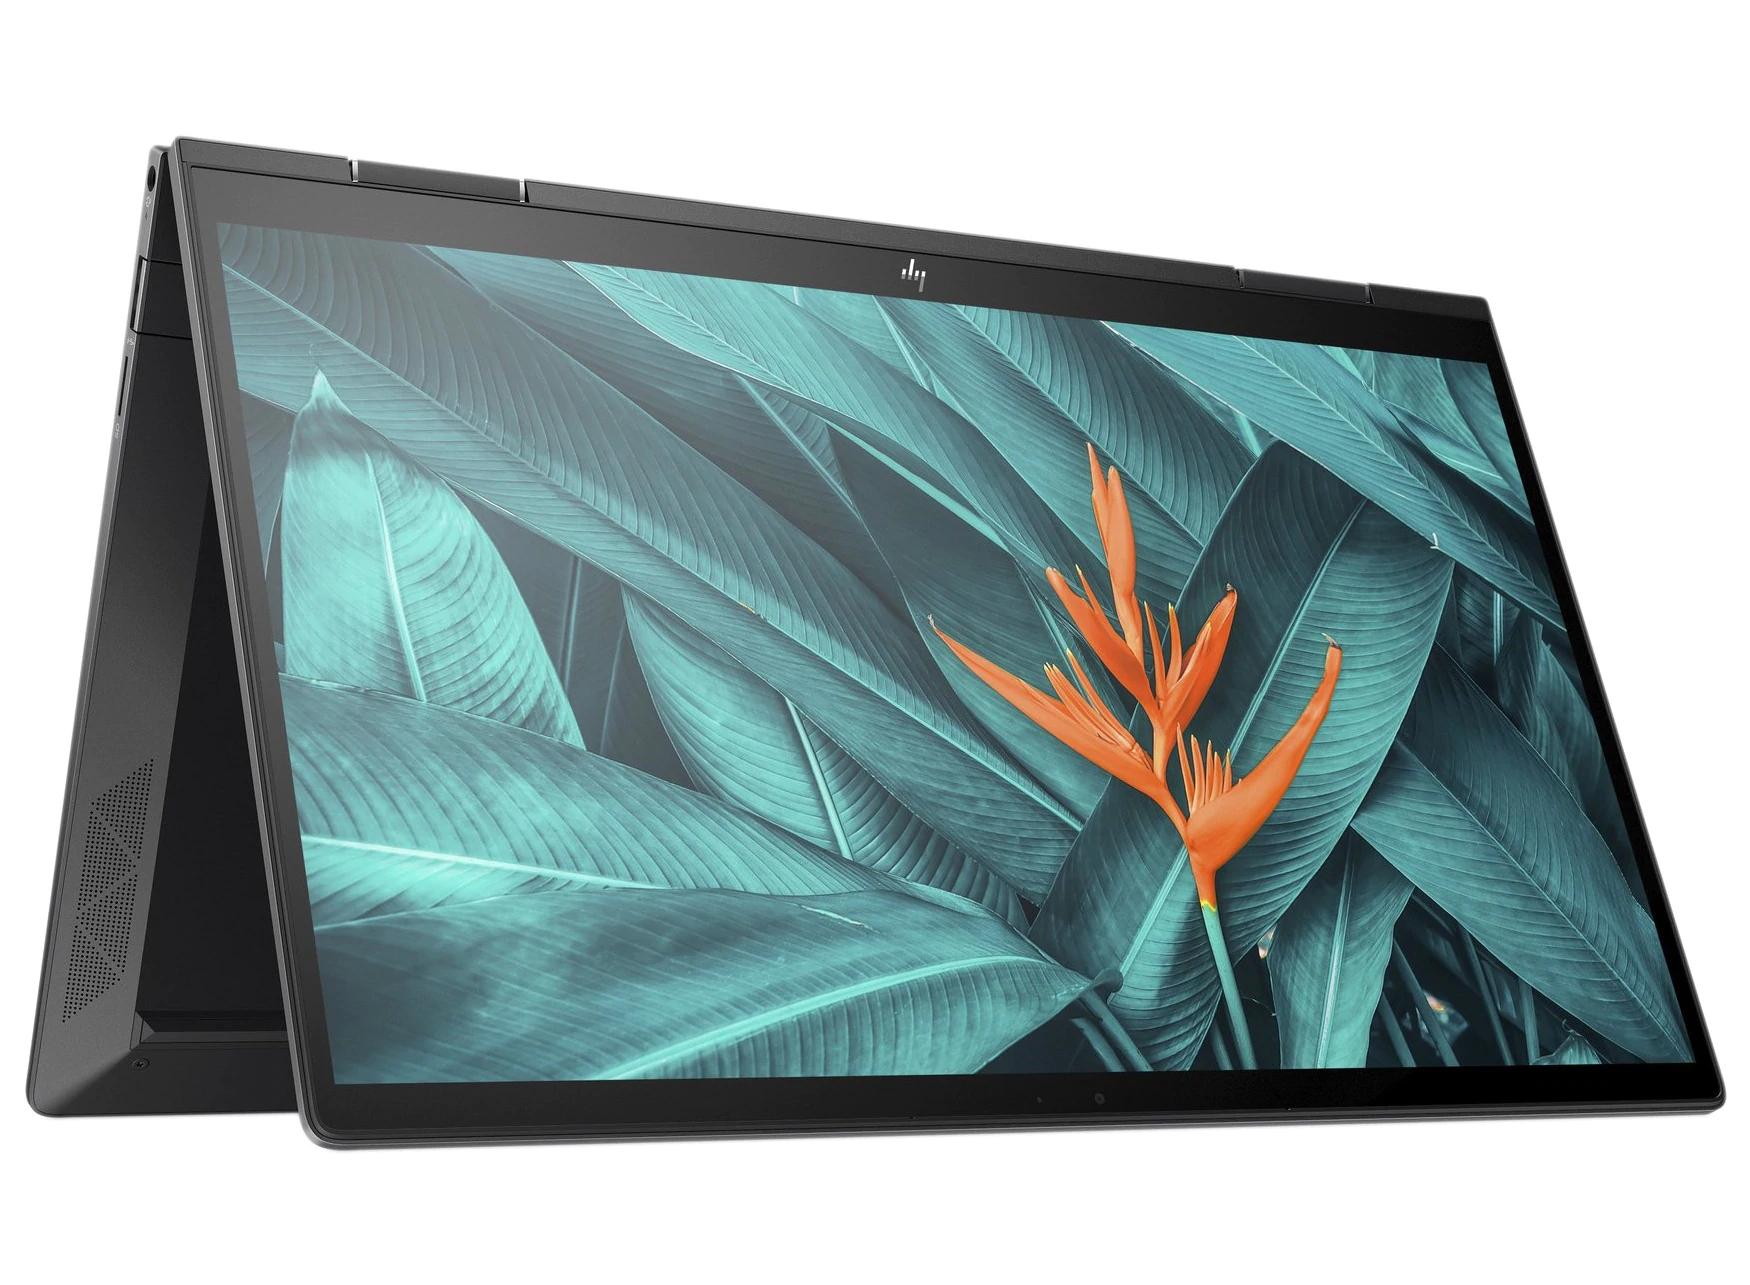 2020 HP ENVY x360 13, 2-in-1, Touchscreen, Ryzen 7 4700U 2.0GHz, 16GB DDR4, 512GB SSD, FHD IPS £926.26 at HP Shop